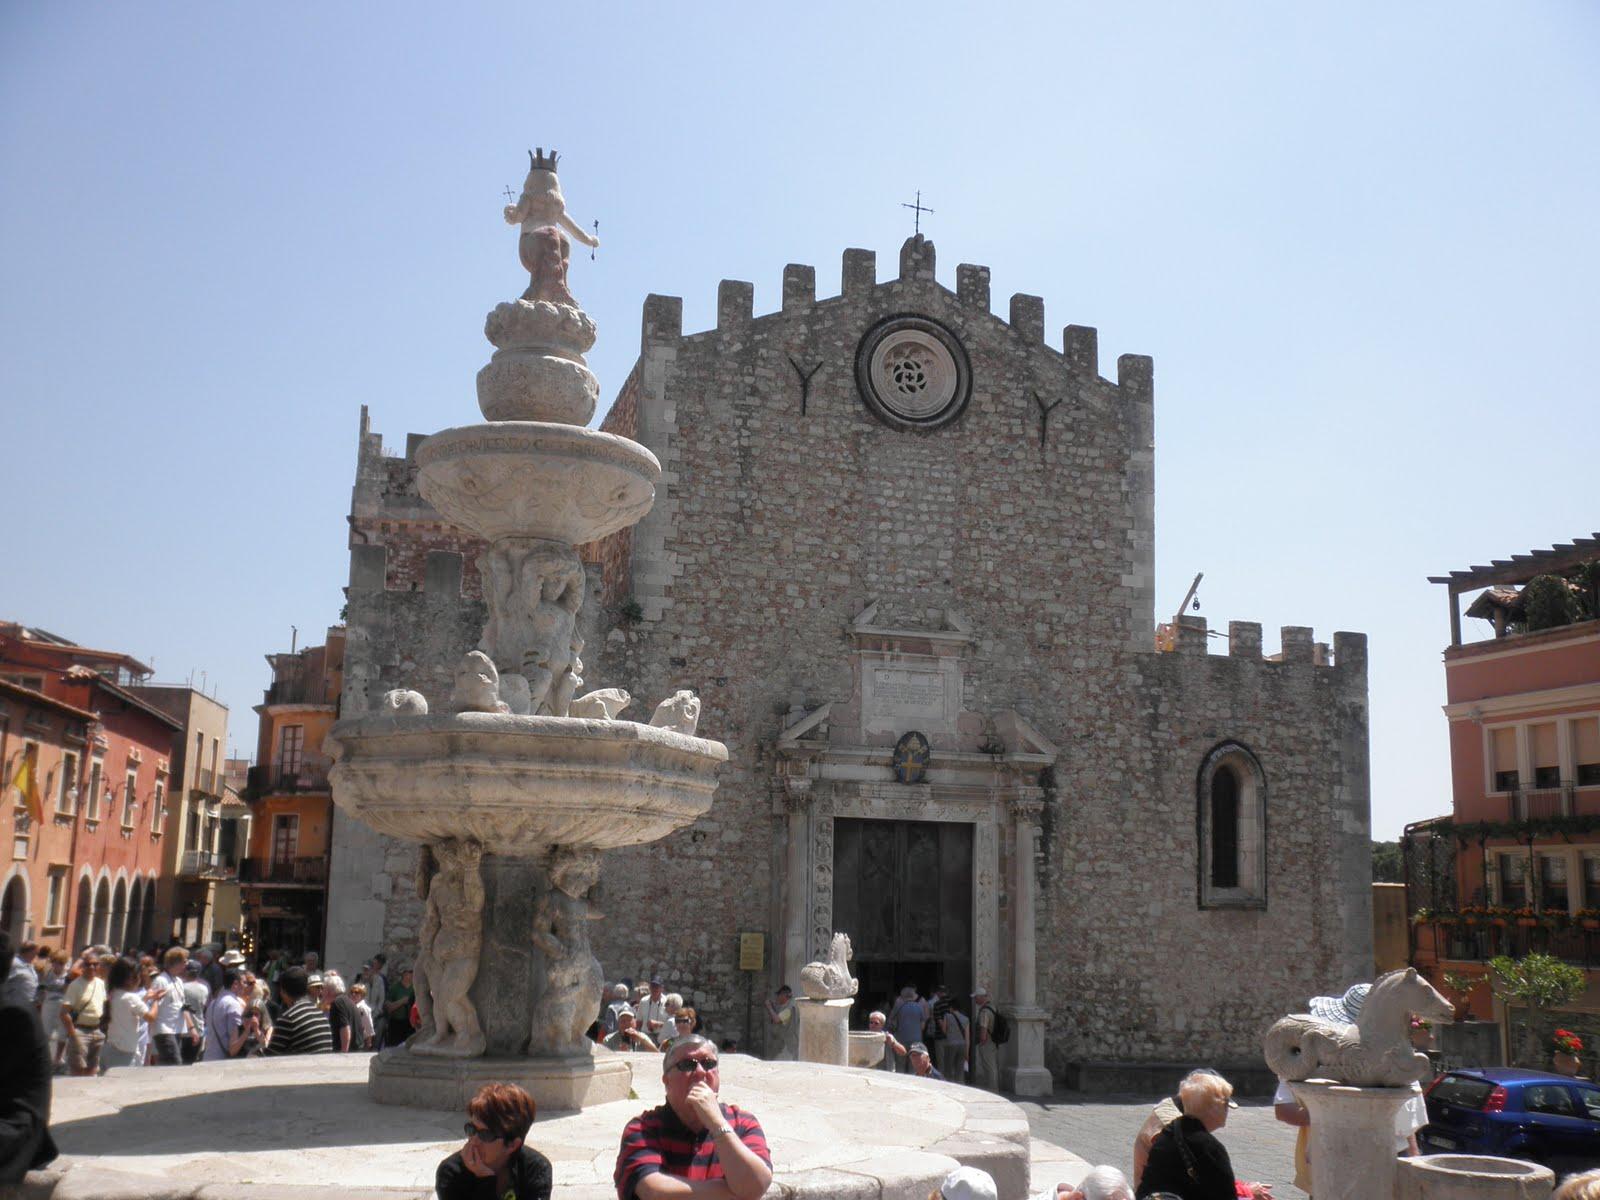 Messina Italy  City new picture : Ron & Cindy's Vacation: 4/30 Messina, Italy Sicily